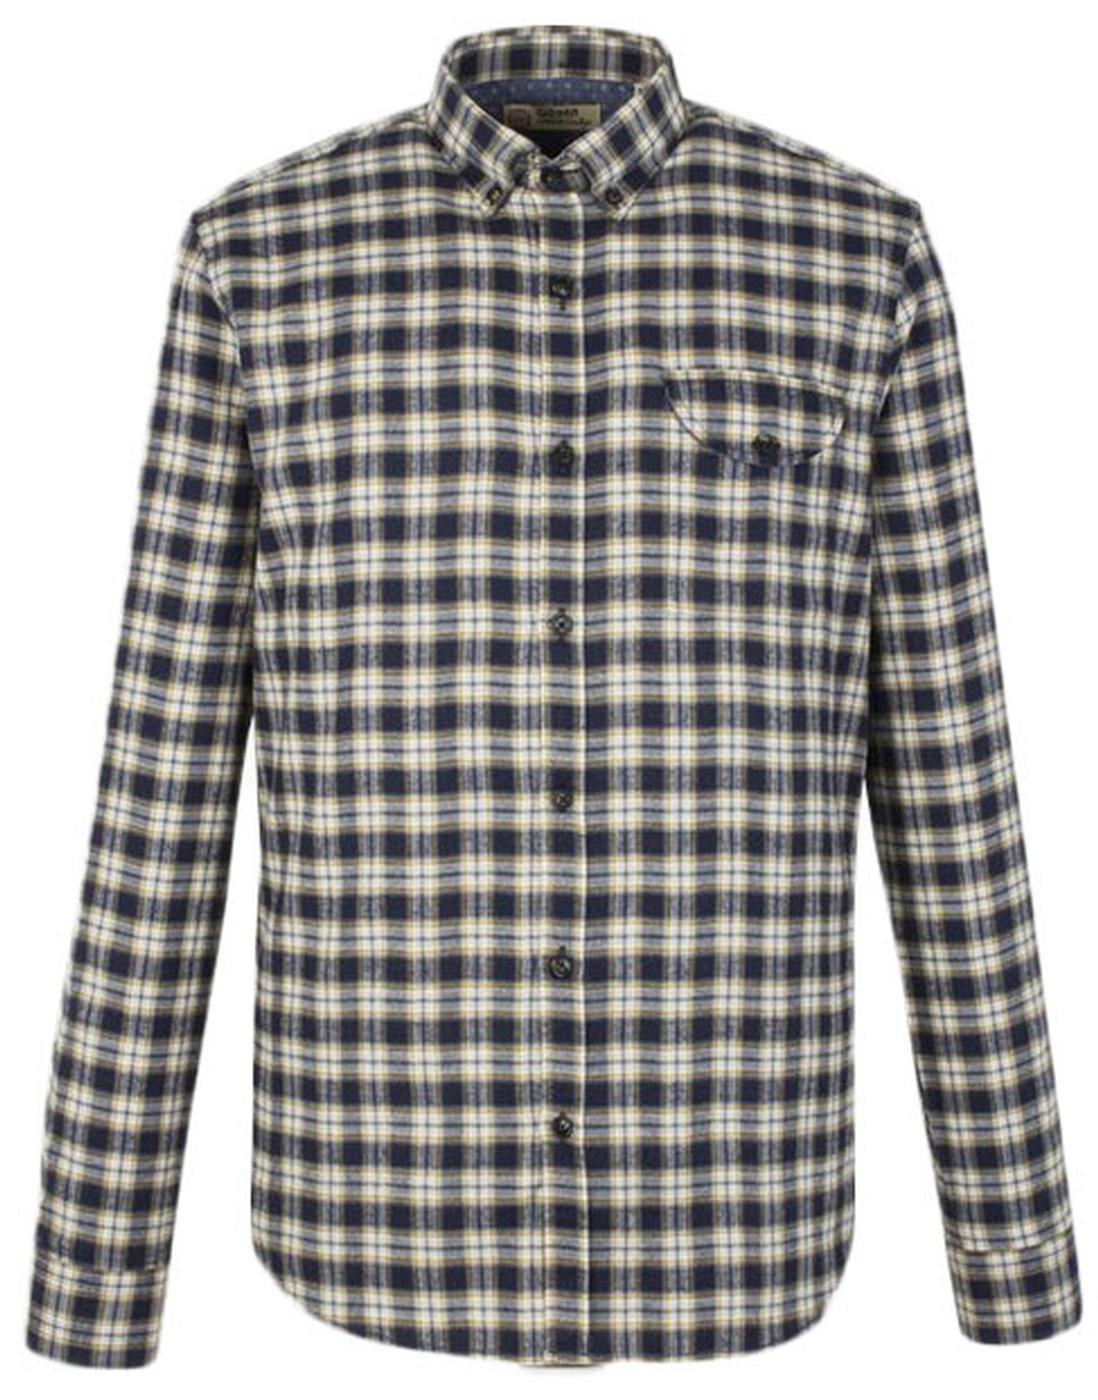 GIBSON LONDON Mod Ivy league BD Check Shirt (M)